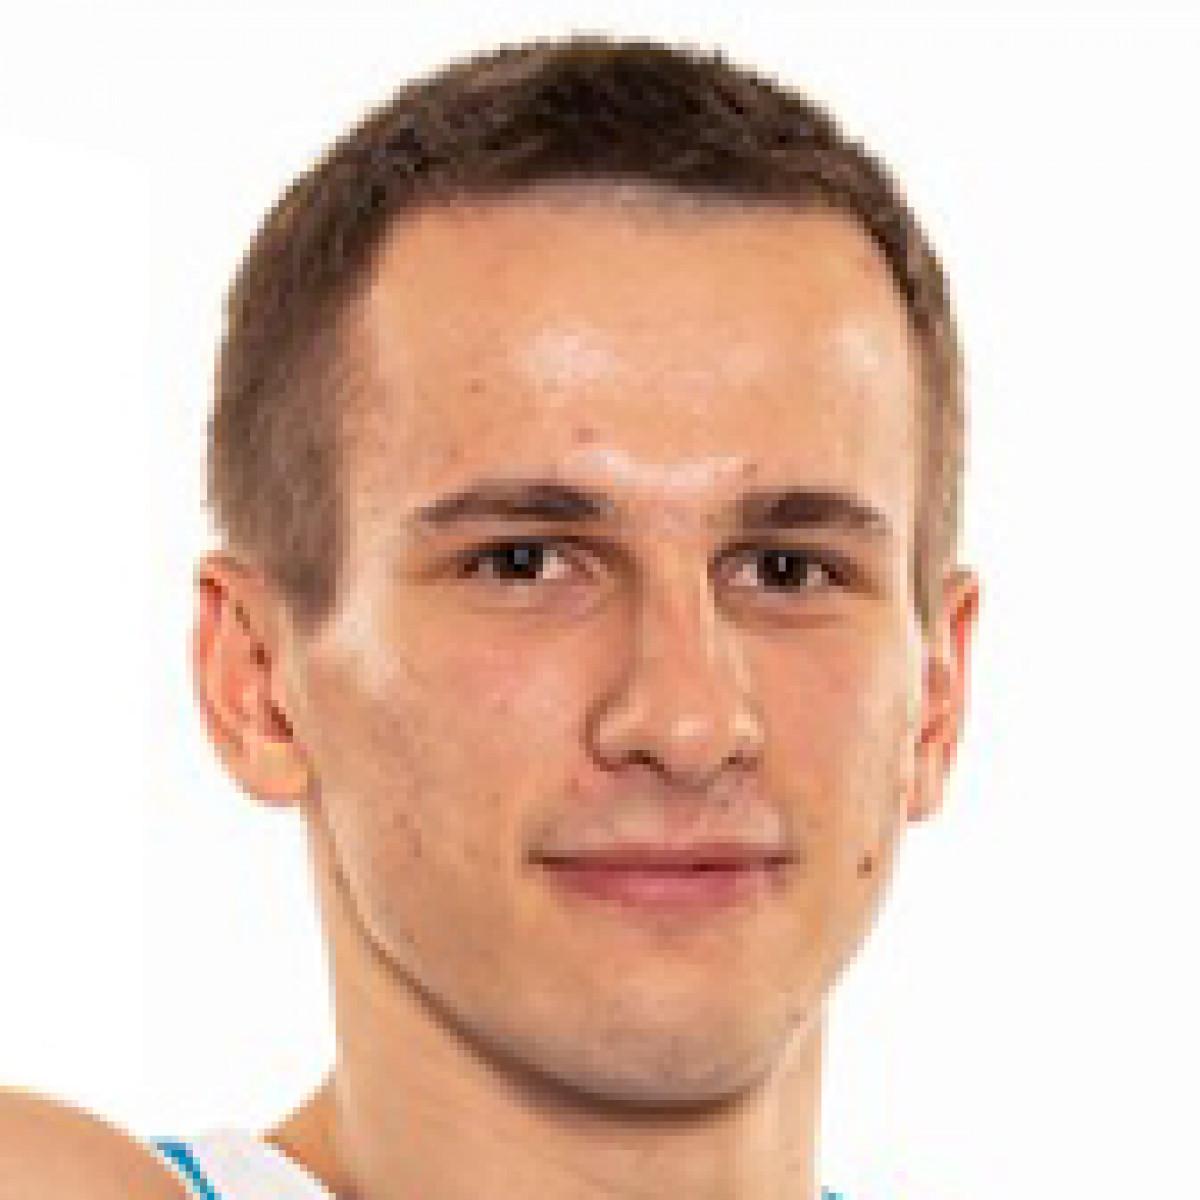 Dmytro Holovchyk